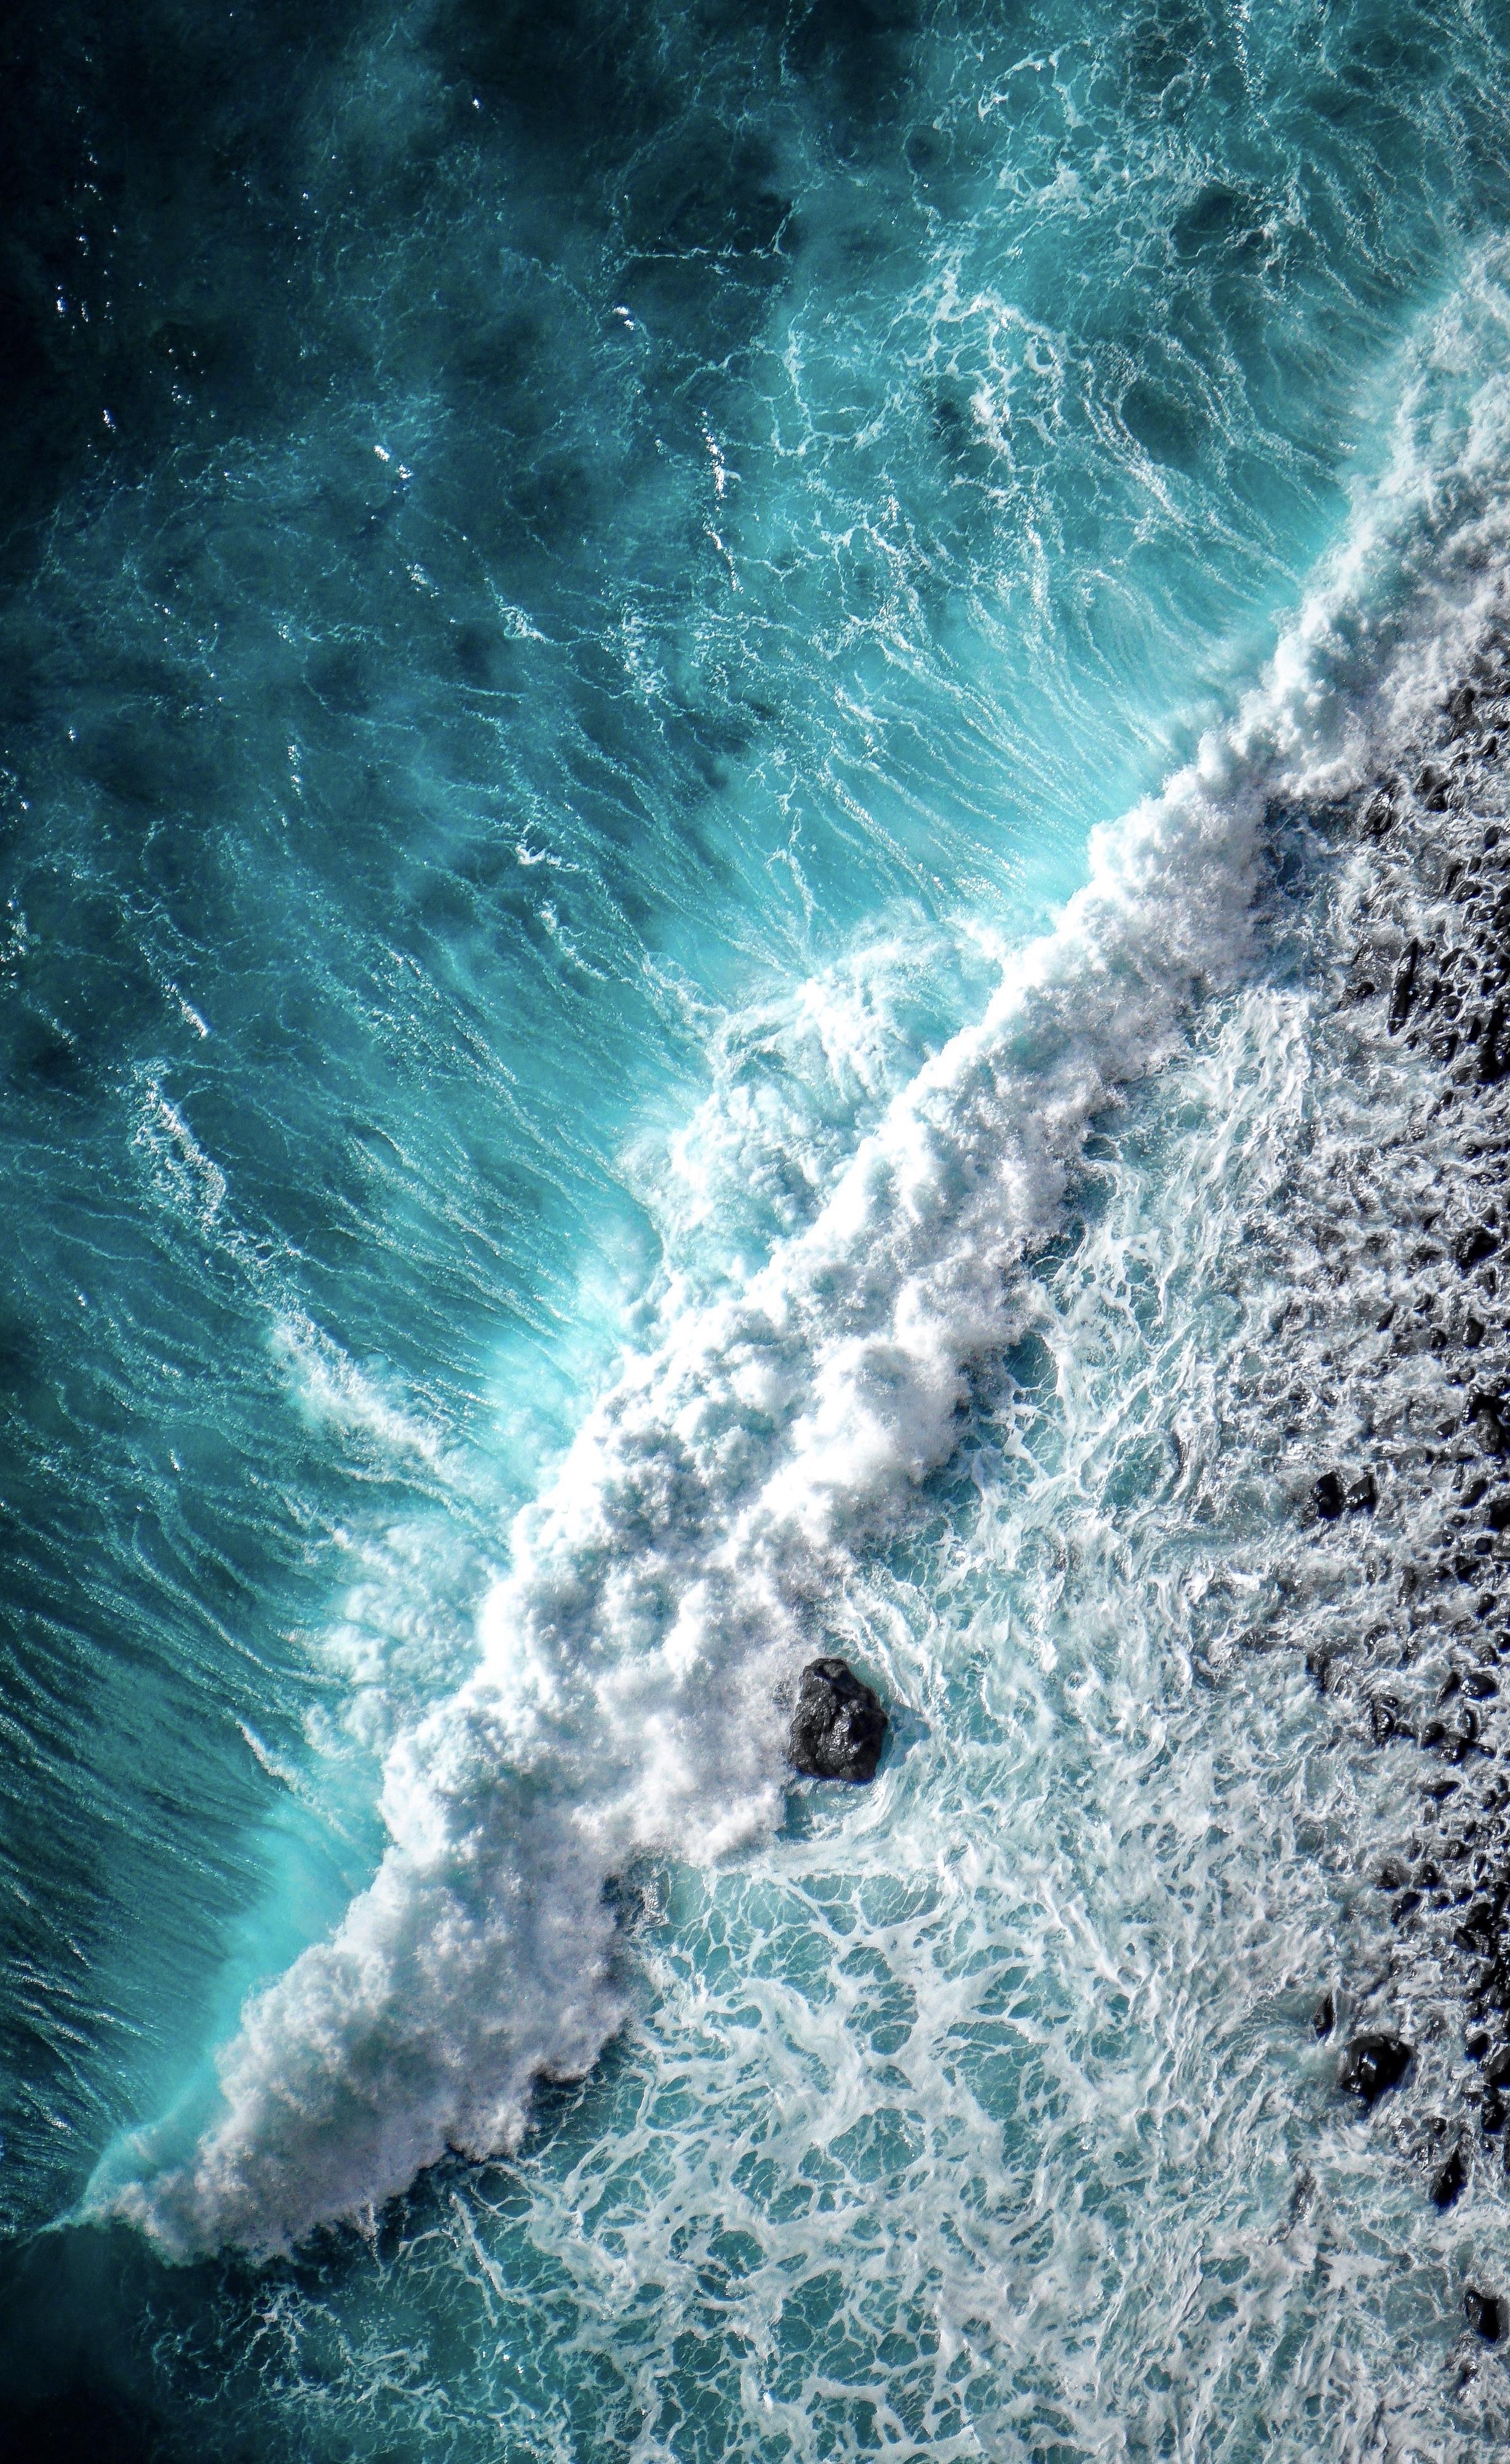 Ocean Wallpapers HD Download [500 HQ] Unsplash 2455x4006